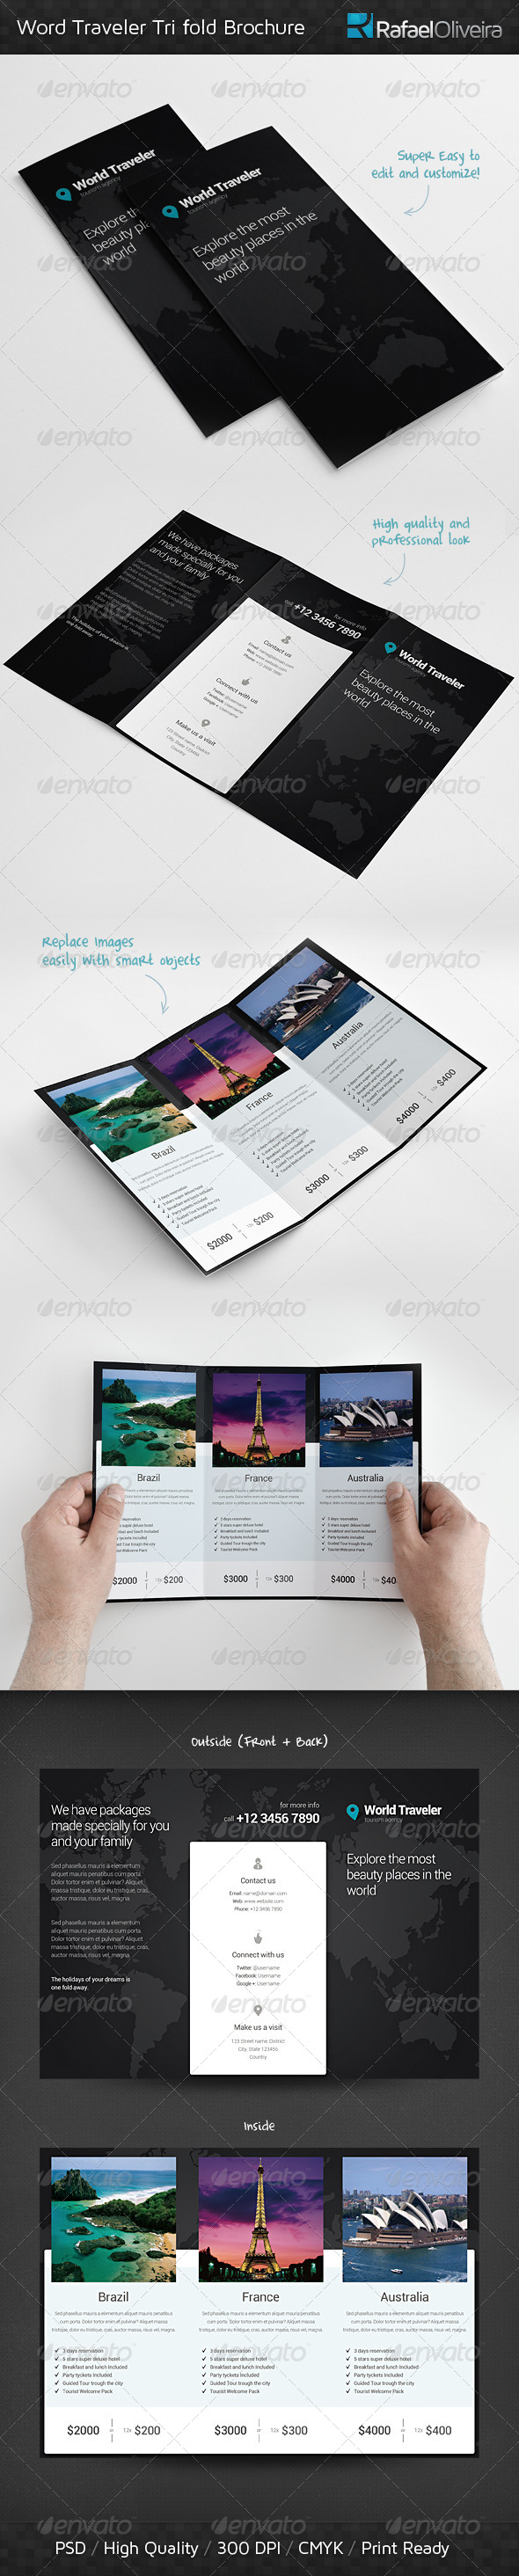 World Traveler Tri Fold Brochure - Corporate Brochures